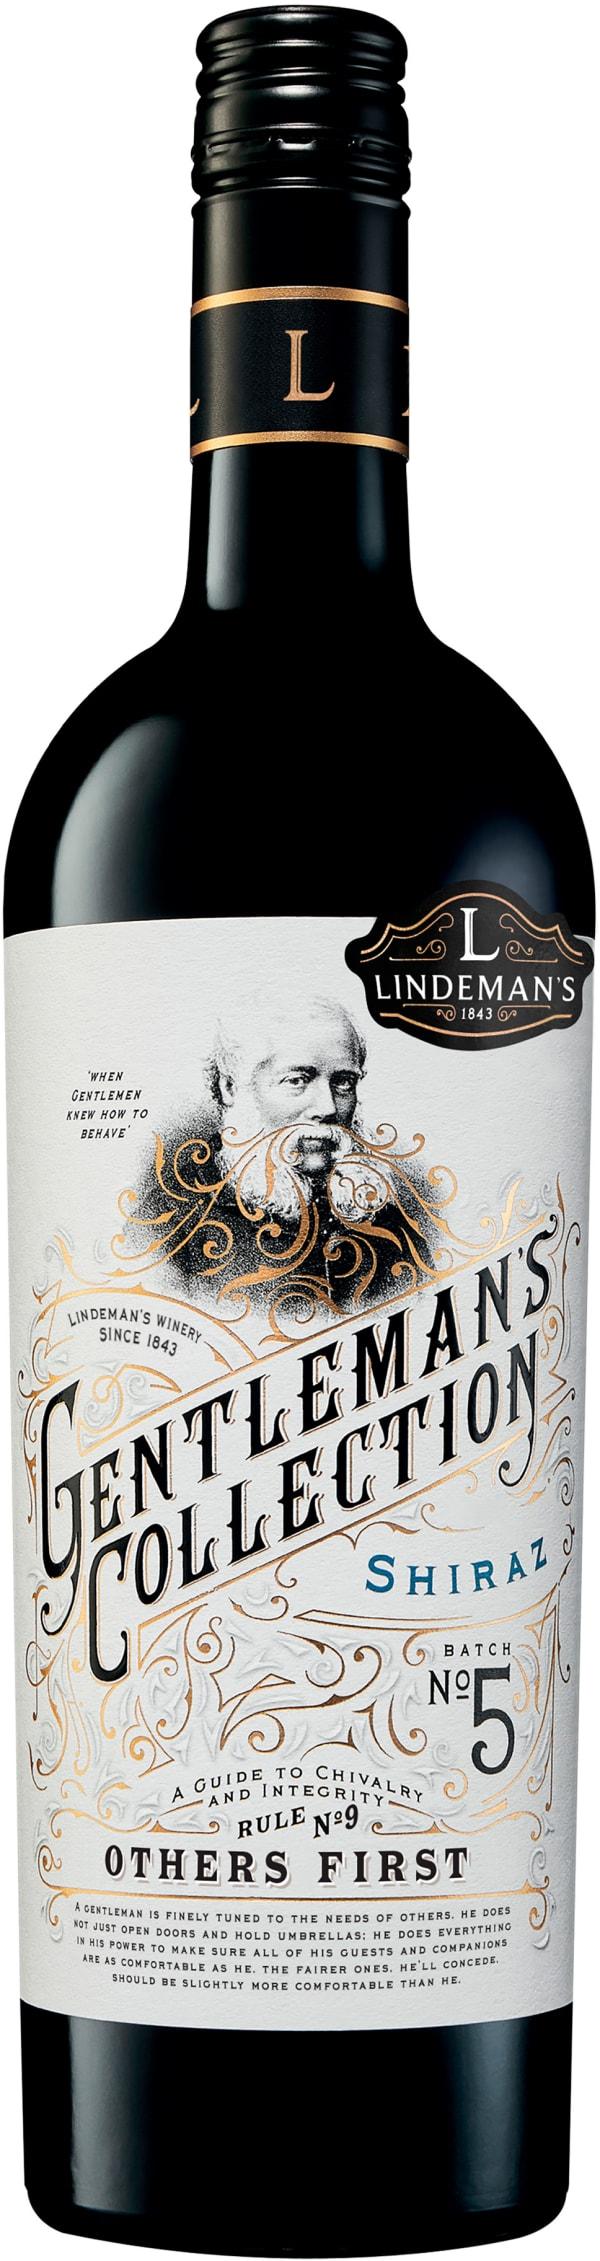 Lindeman's Gentlemans Collection Shiraz